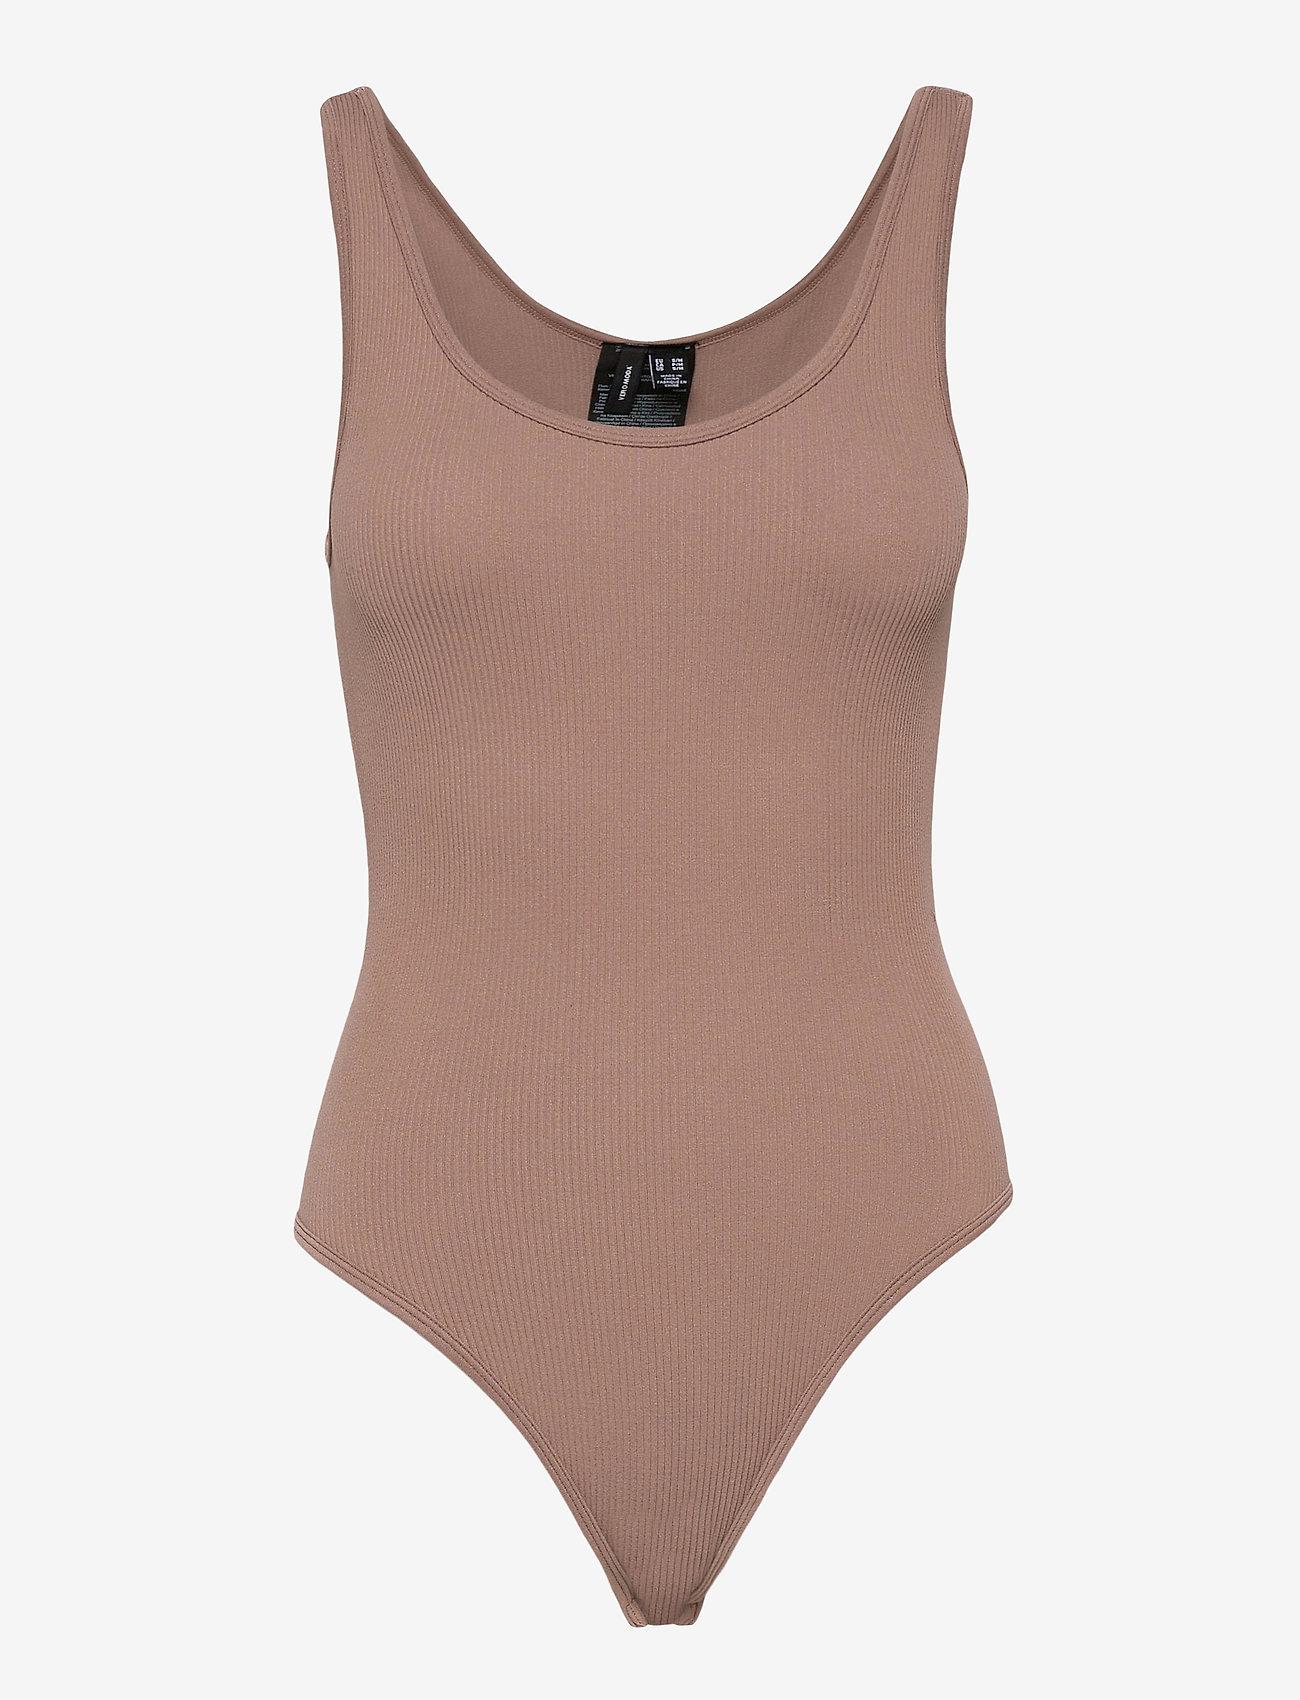 Vero Moda - VMEVE BODYSTOCKING - bodies - brownie - 1